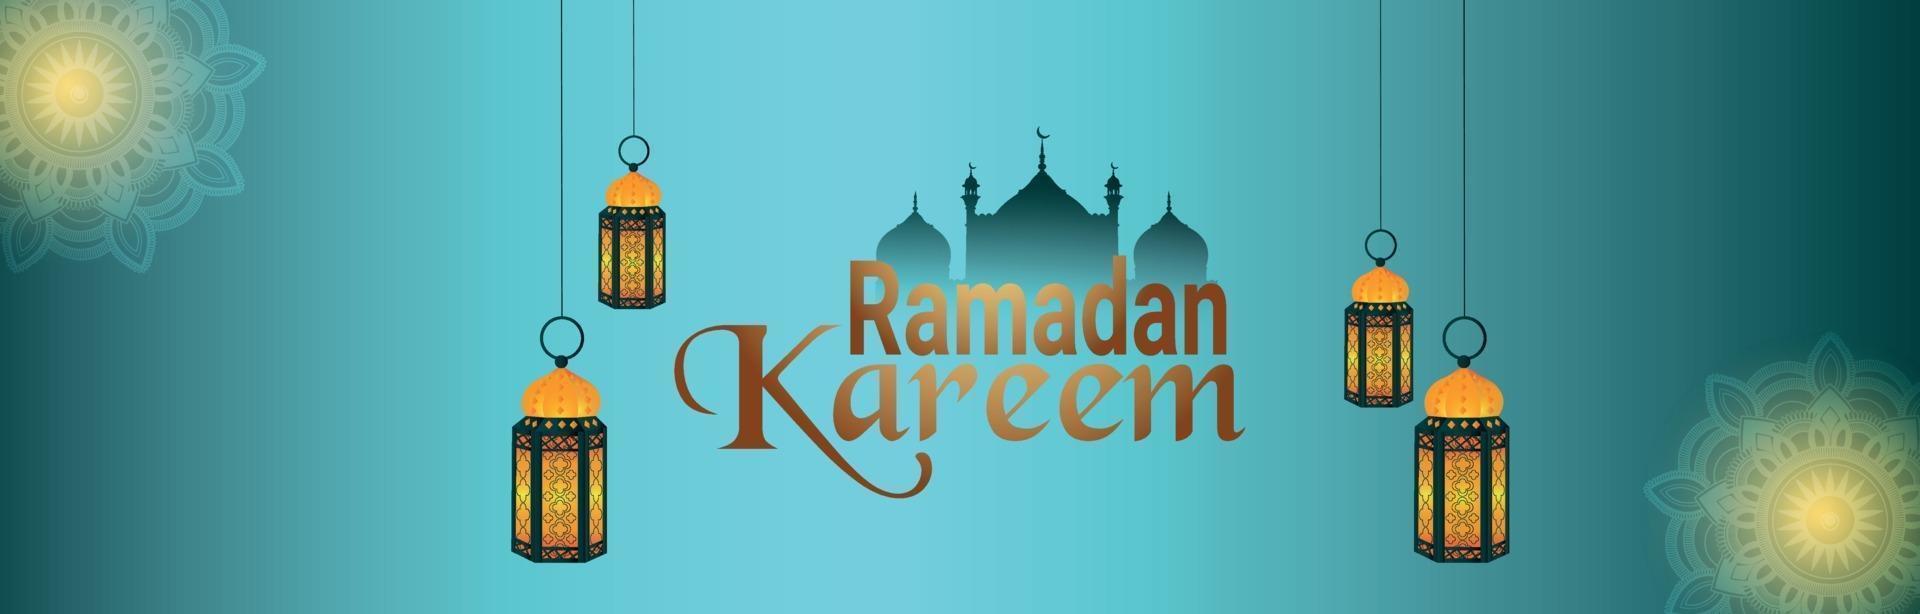 glad ramadan kareem-banner eller rubrik vektor